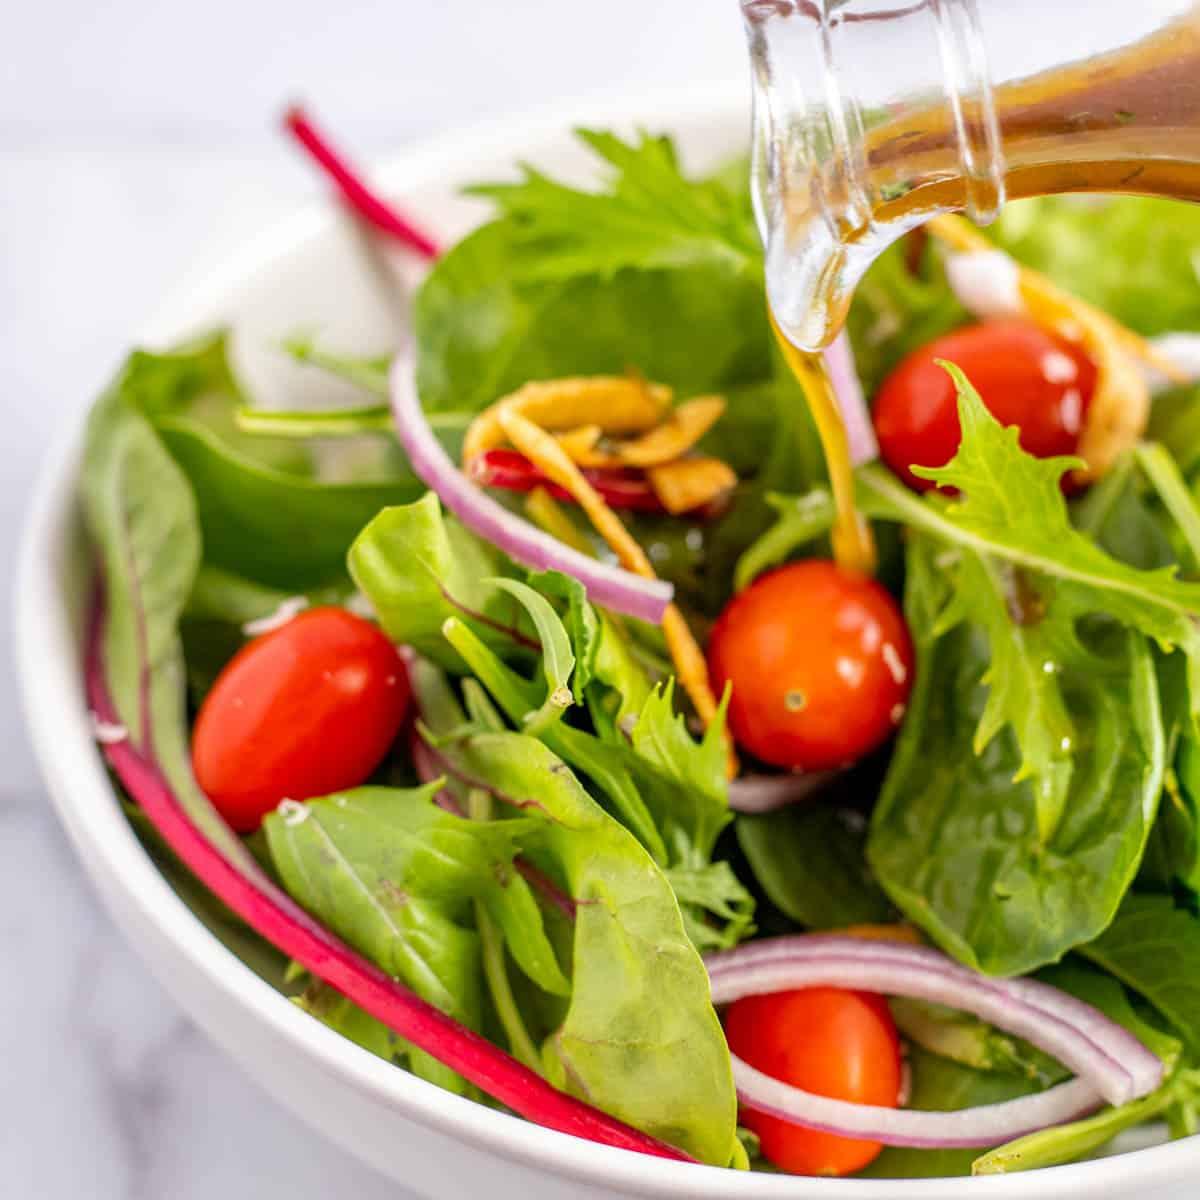 mustard vinaigrette being poured onto salad greens